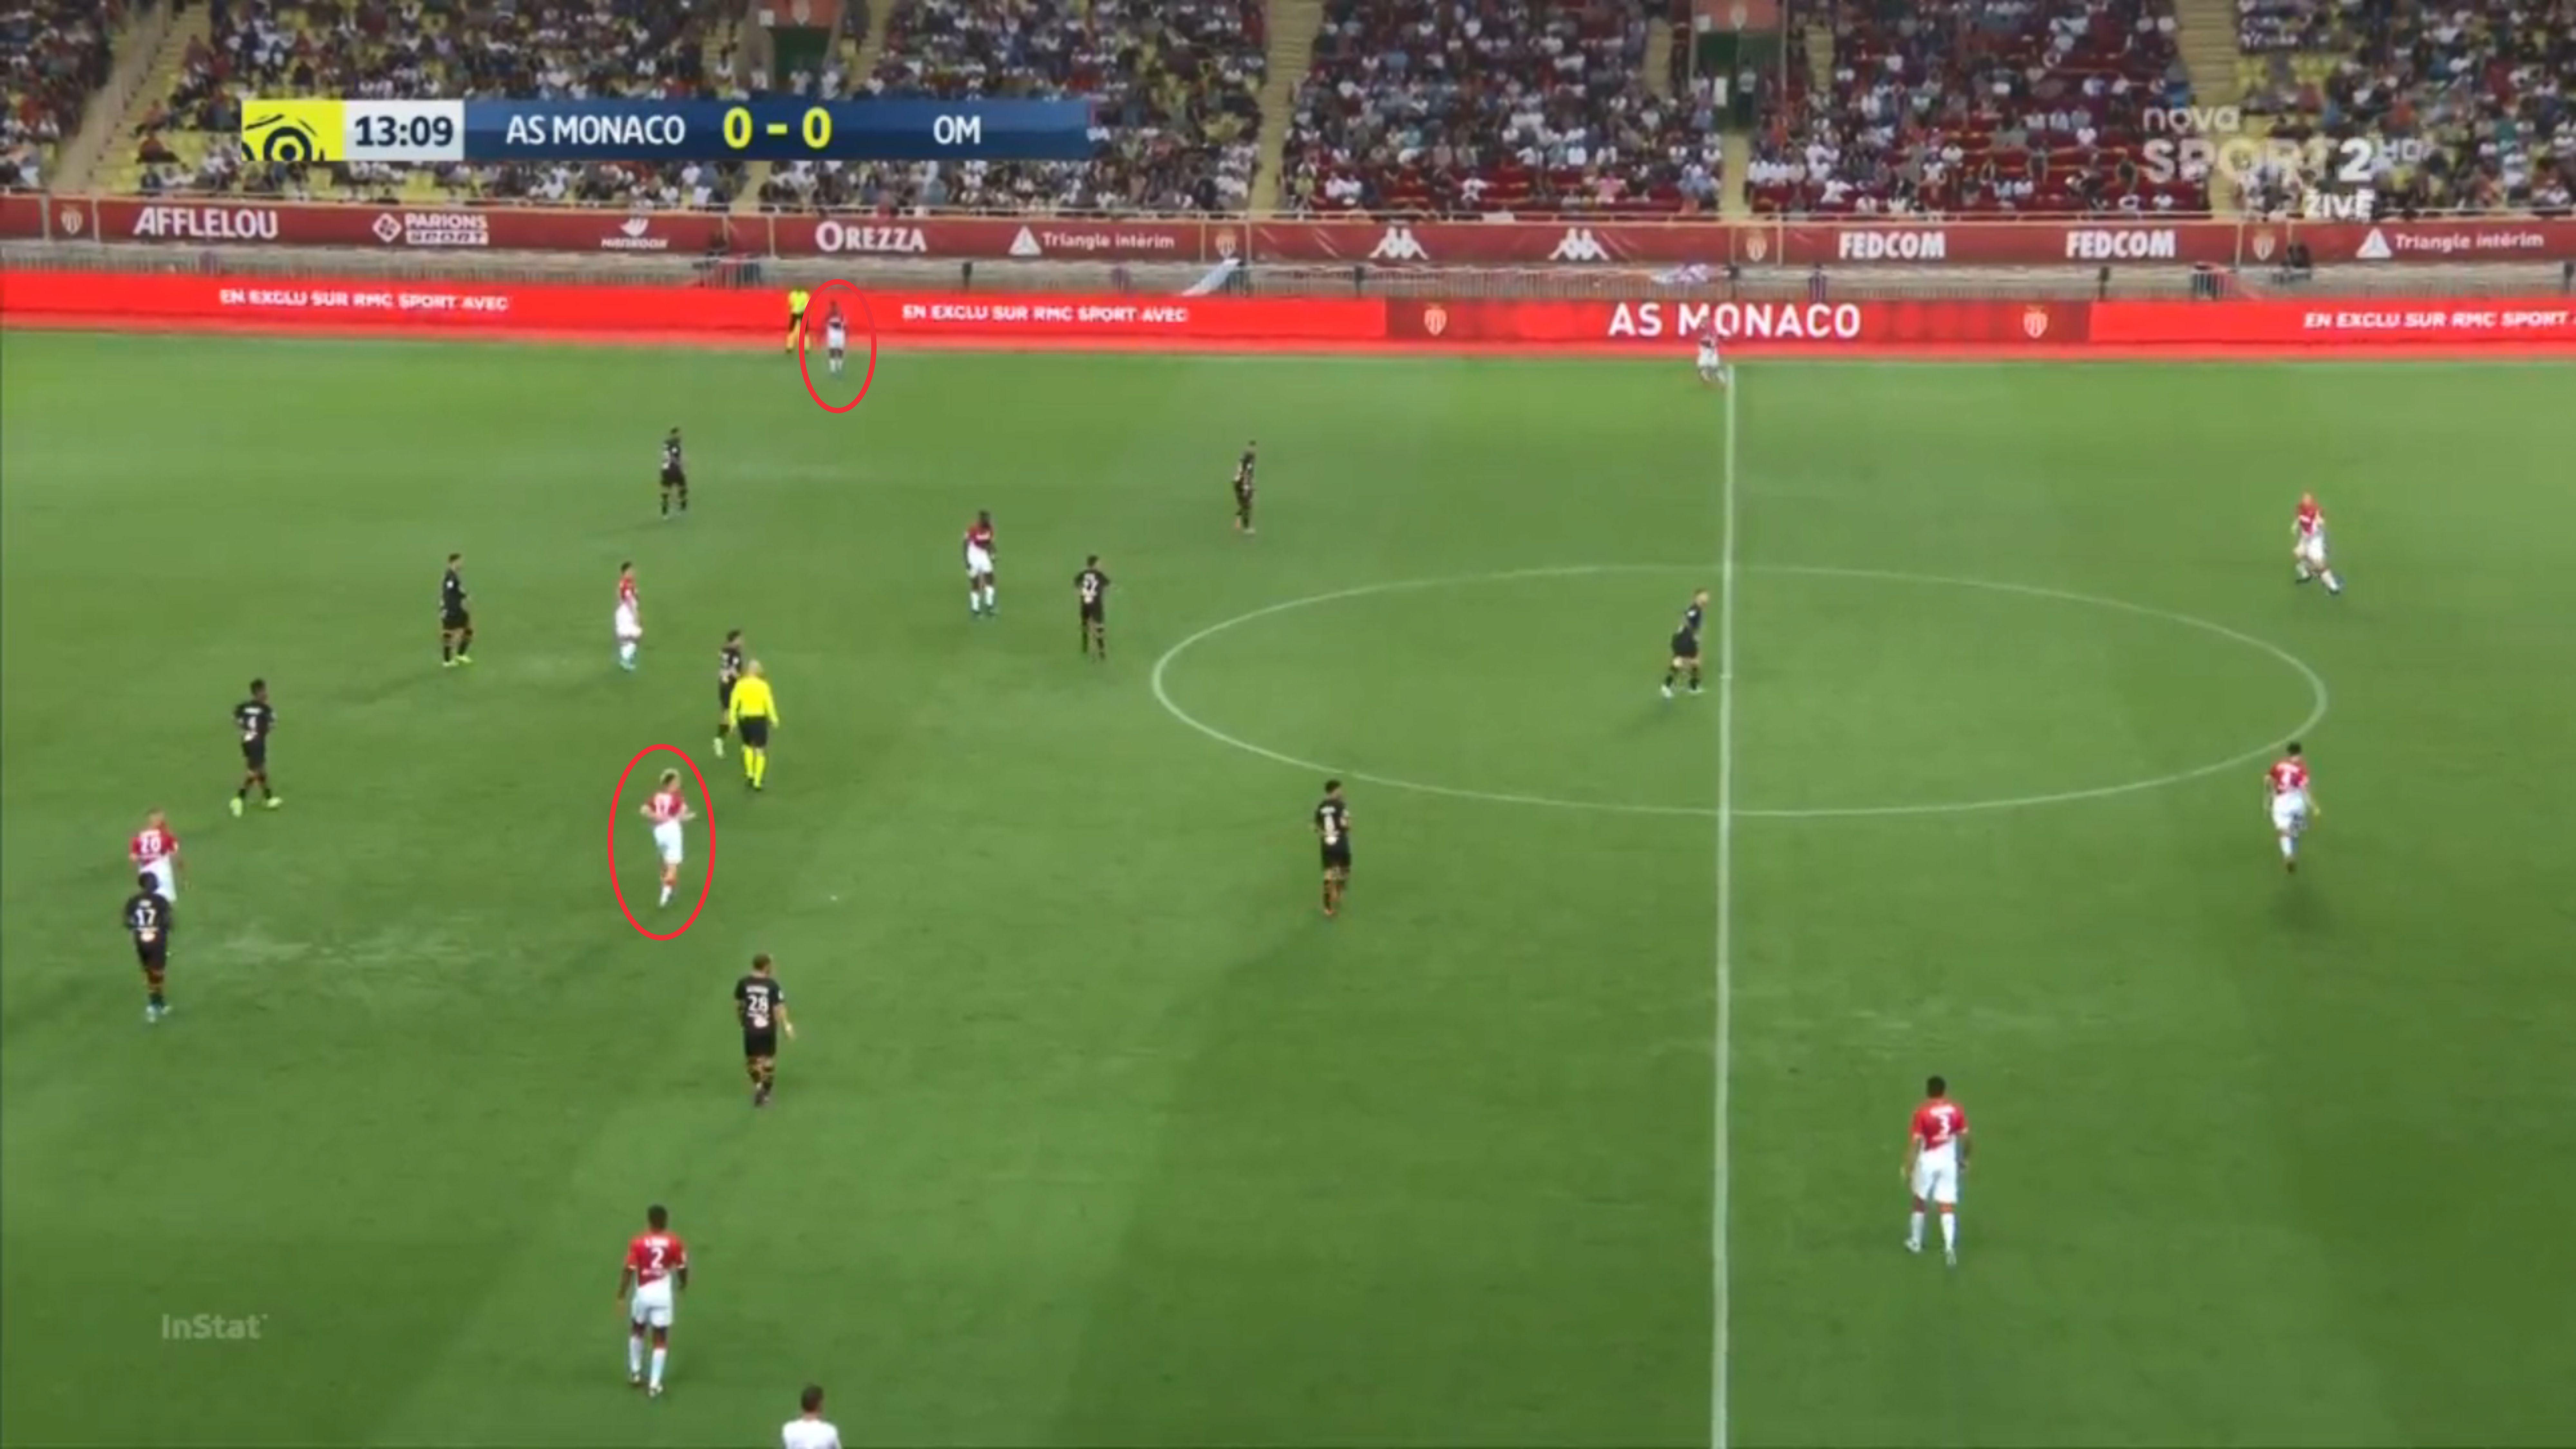 Ligue 1 2019/20: Monaco vs Marseille - tactical analysis tactics